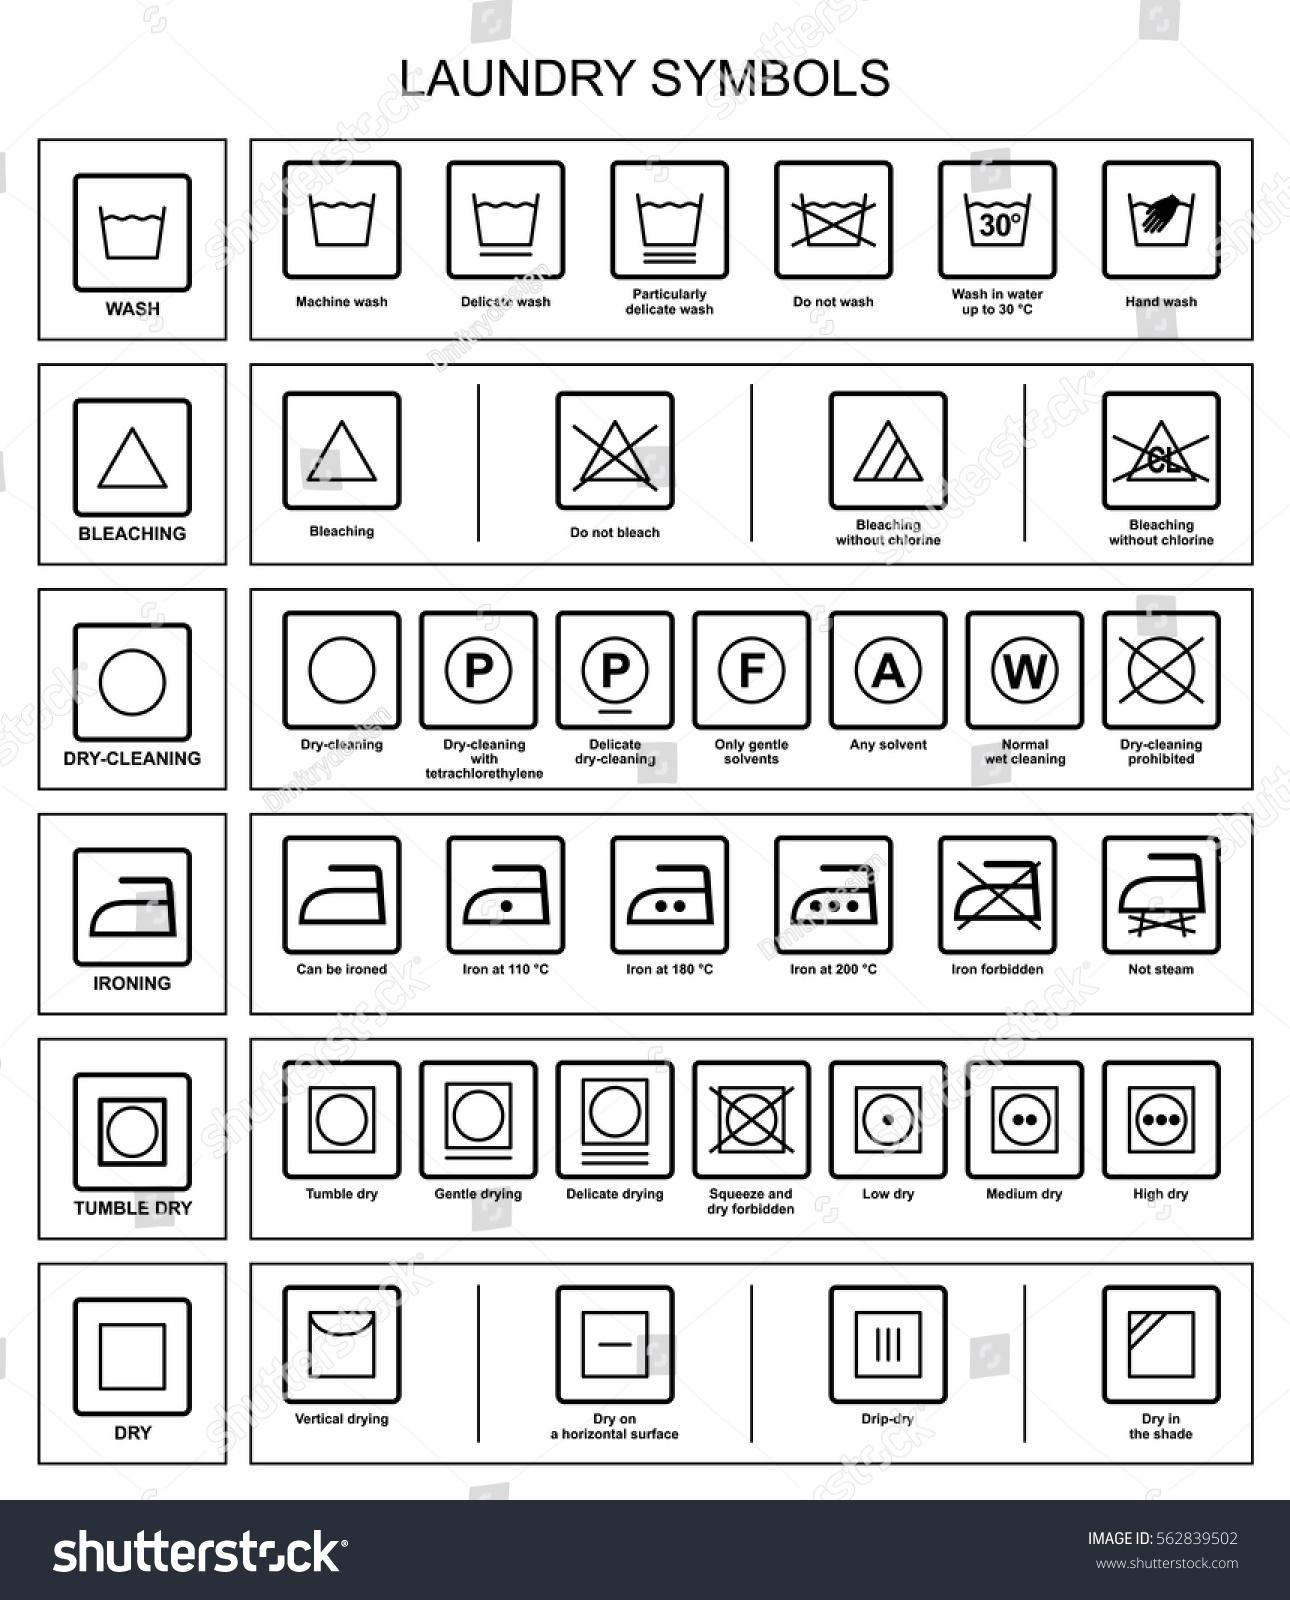 Symbols care textiles laundry symbols vector stock vector symbols for care of textiles laundry symbols in vector buycottarizona